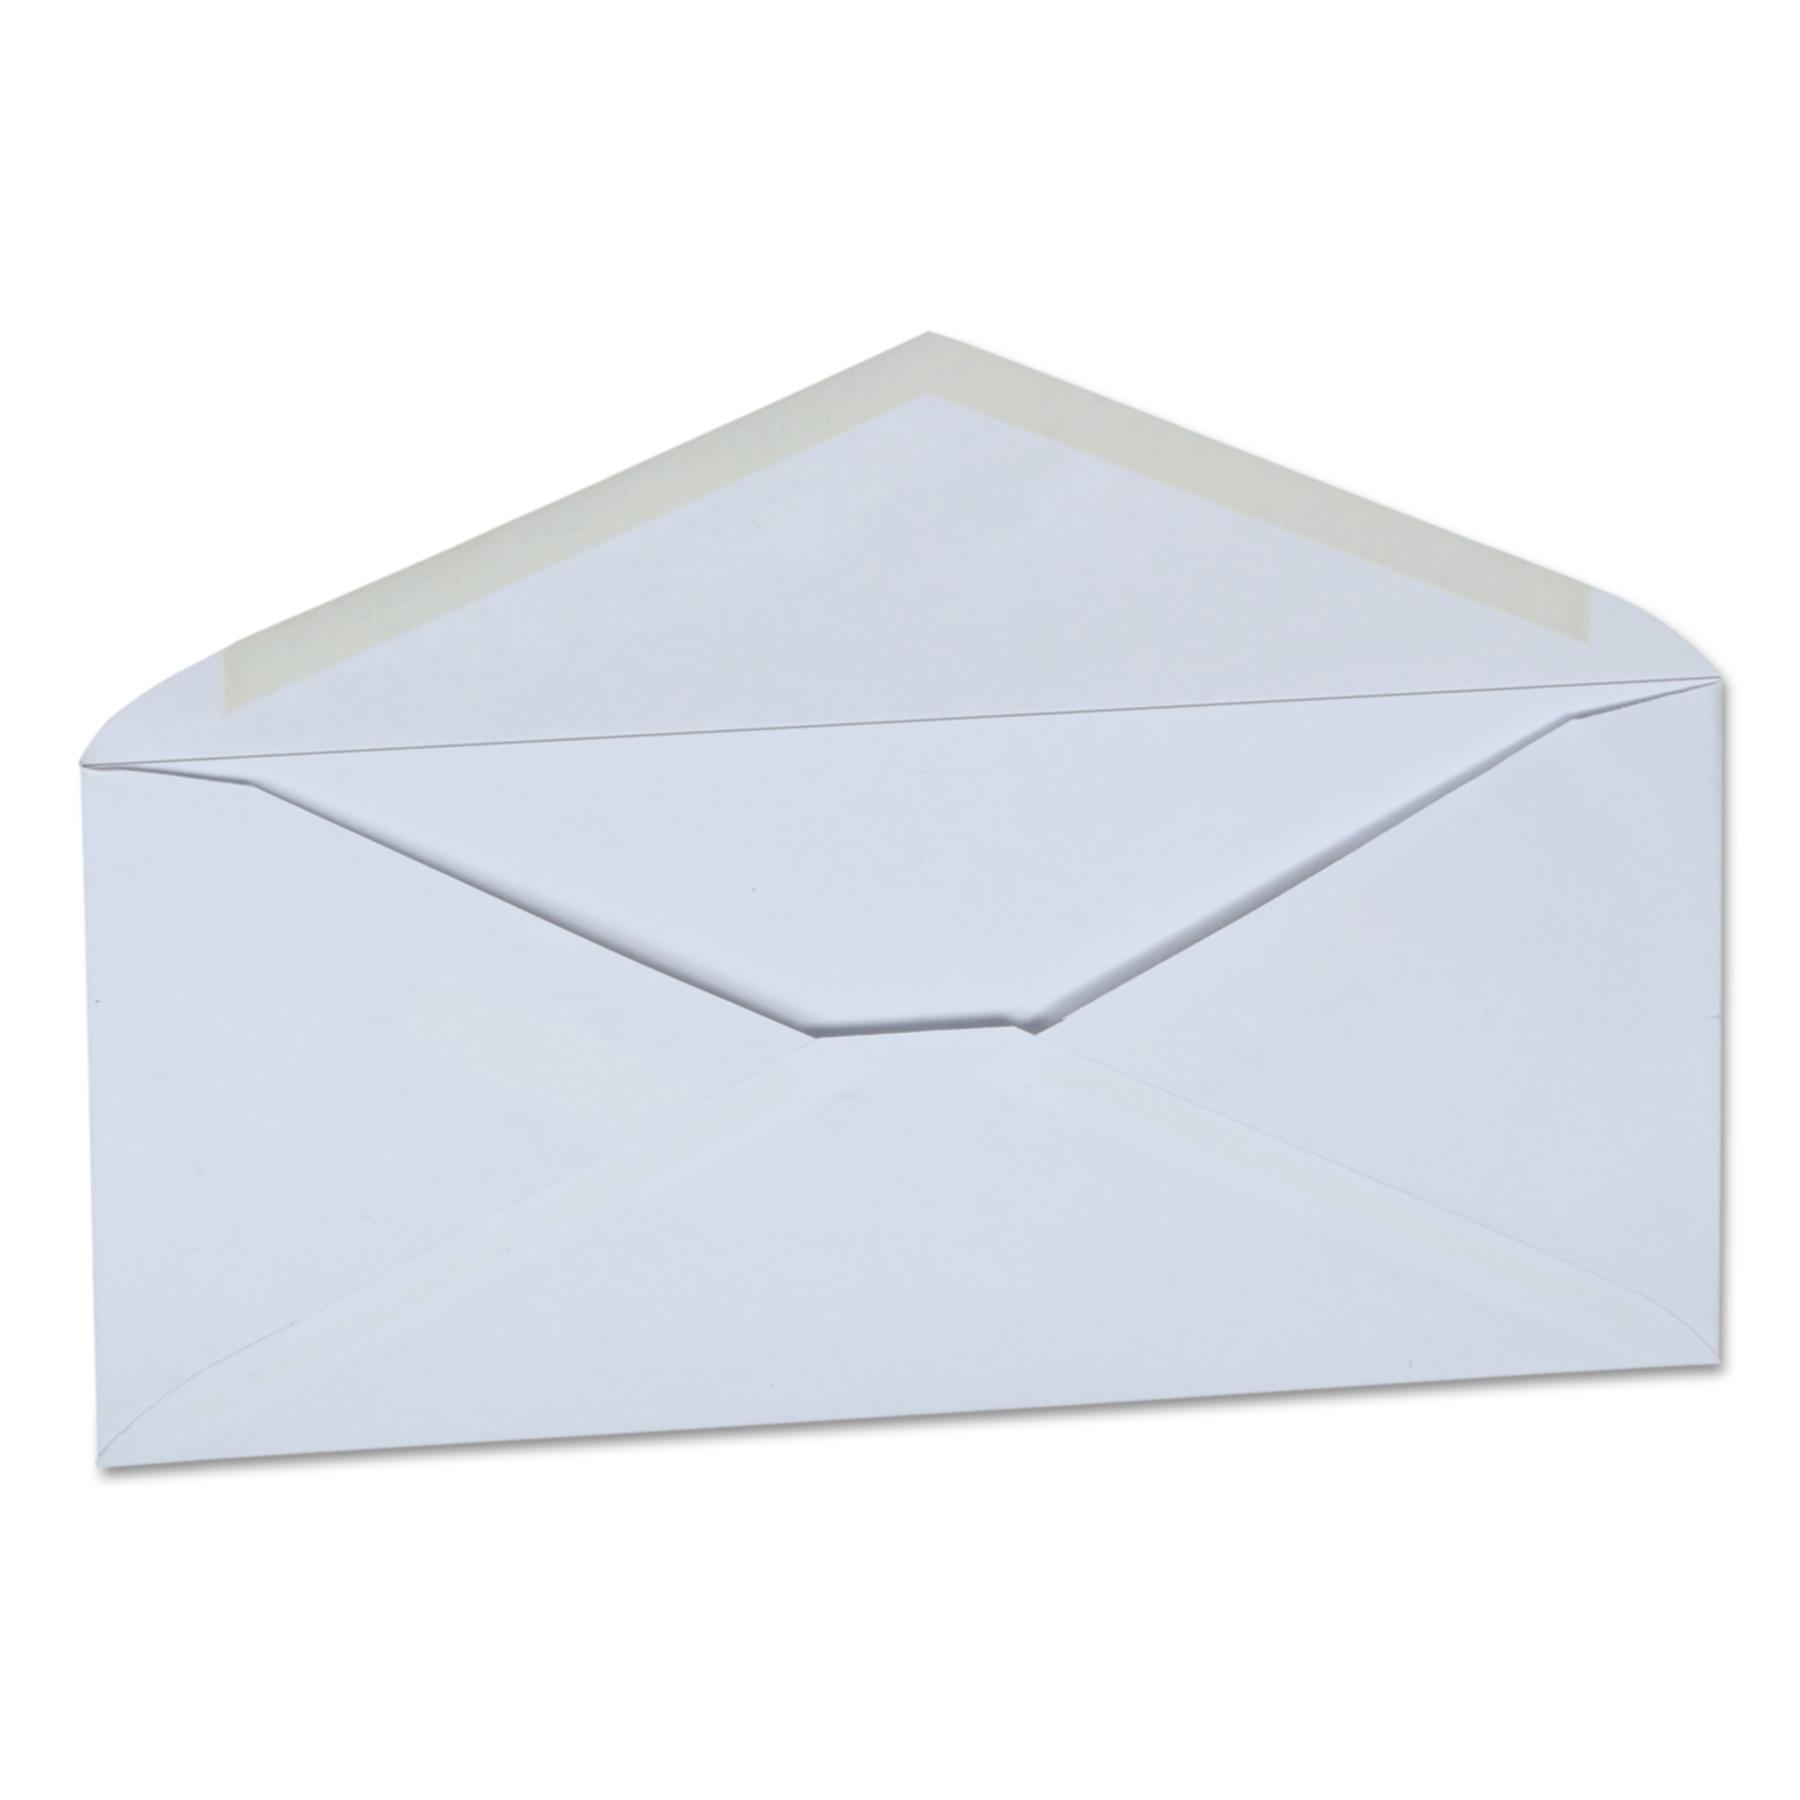 Office Impressions Plain Envelopes, #10, 4 1/8 x 9 1/2, White, 500/Box